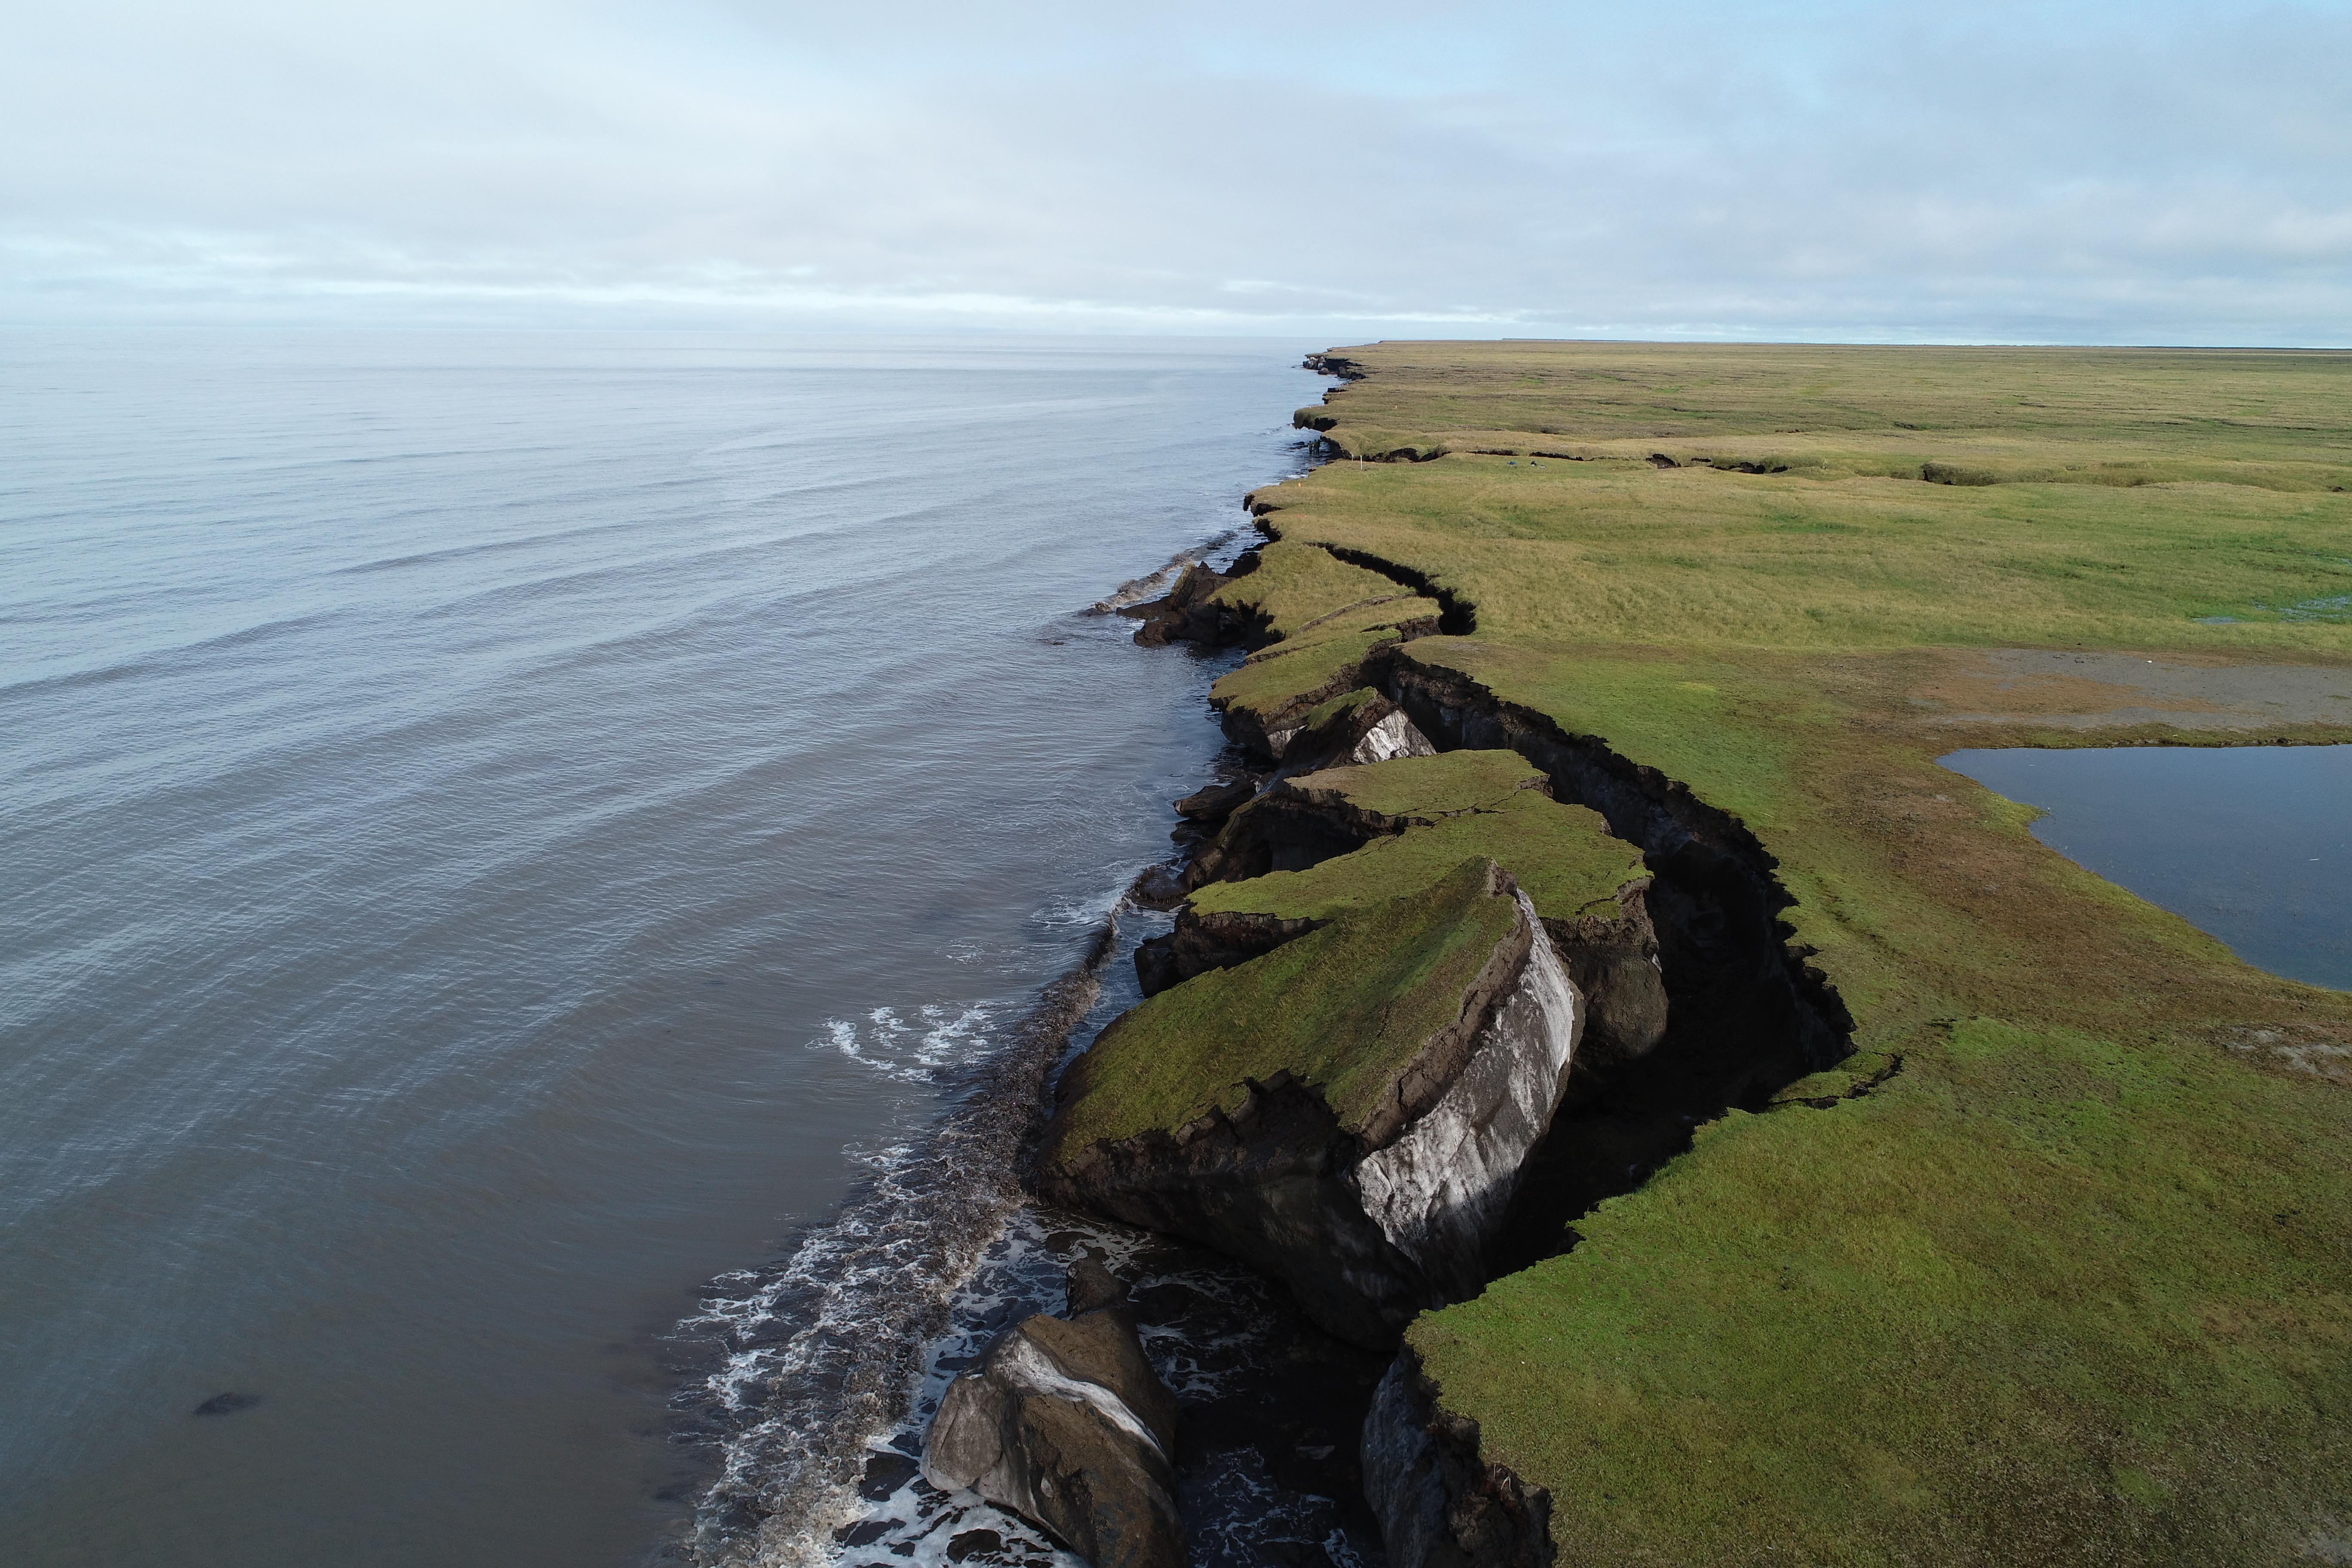 Eroding coastal permafrost bluffs, Drew Point, Alaska.